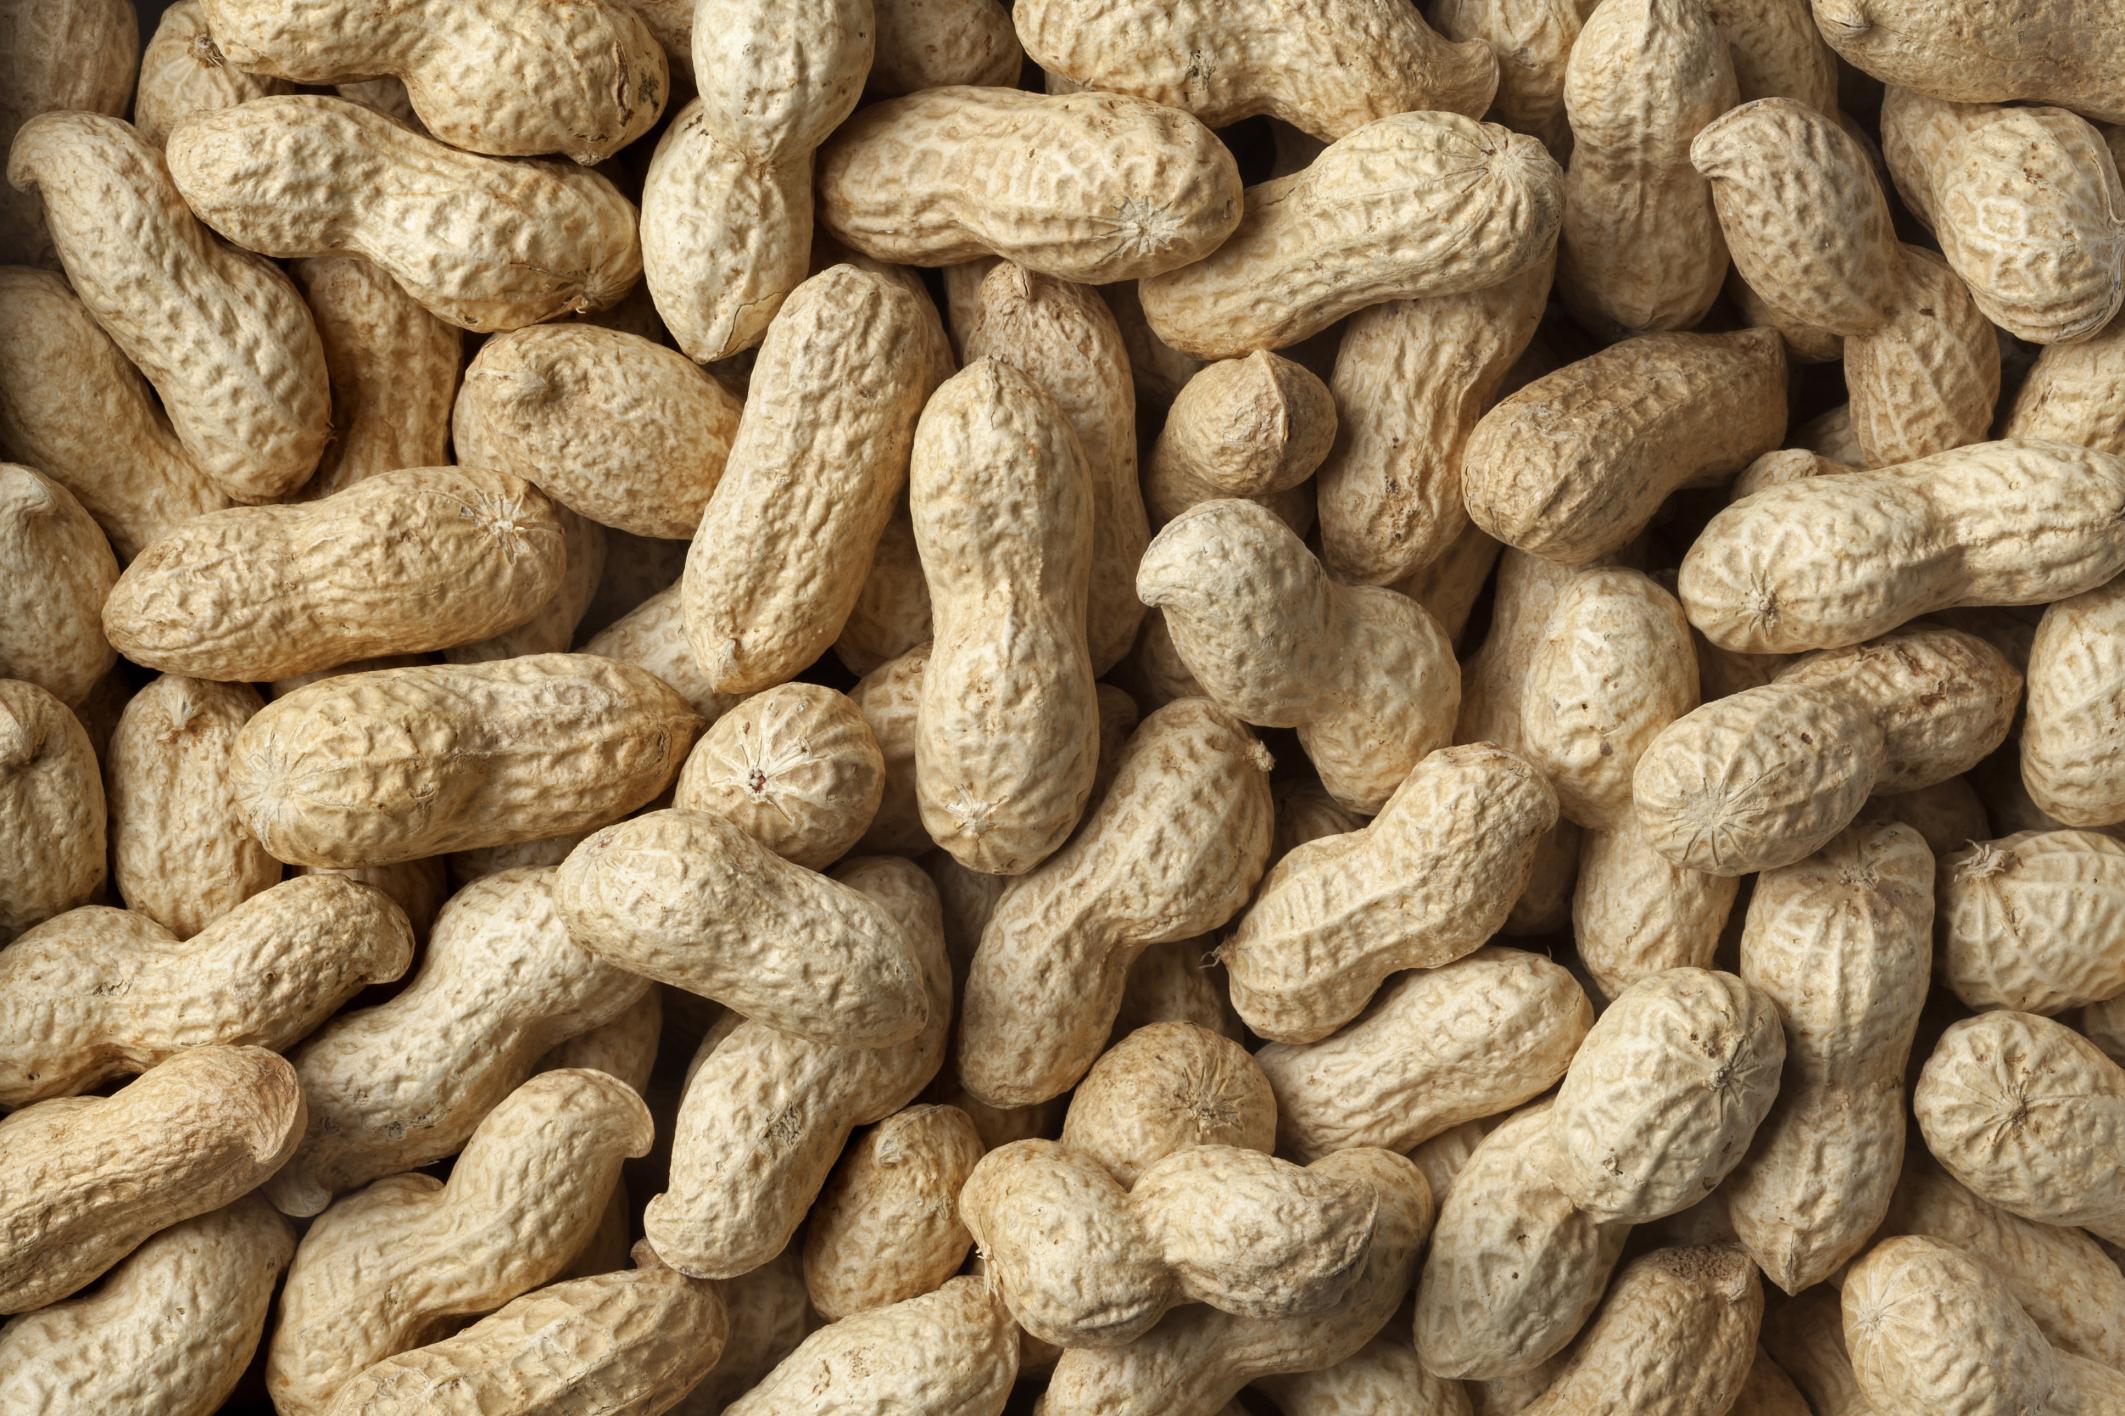 Eating Peanuts & Diverticulitis